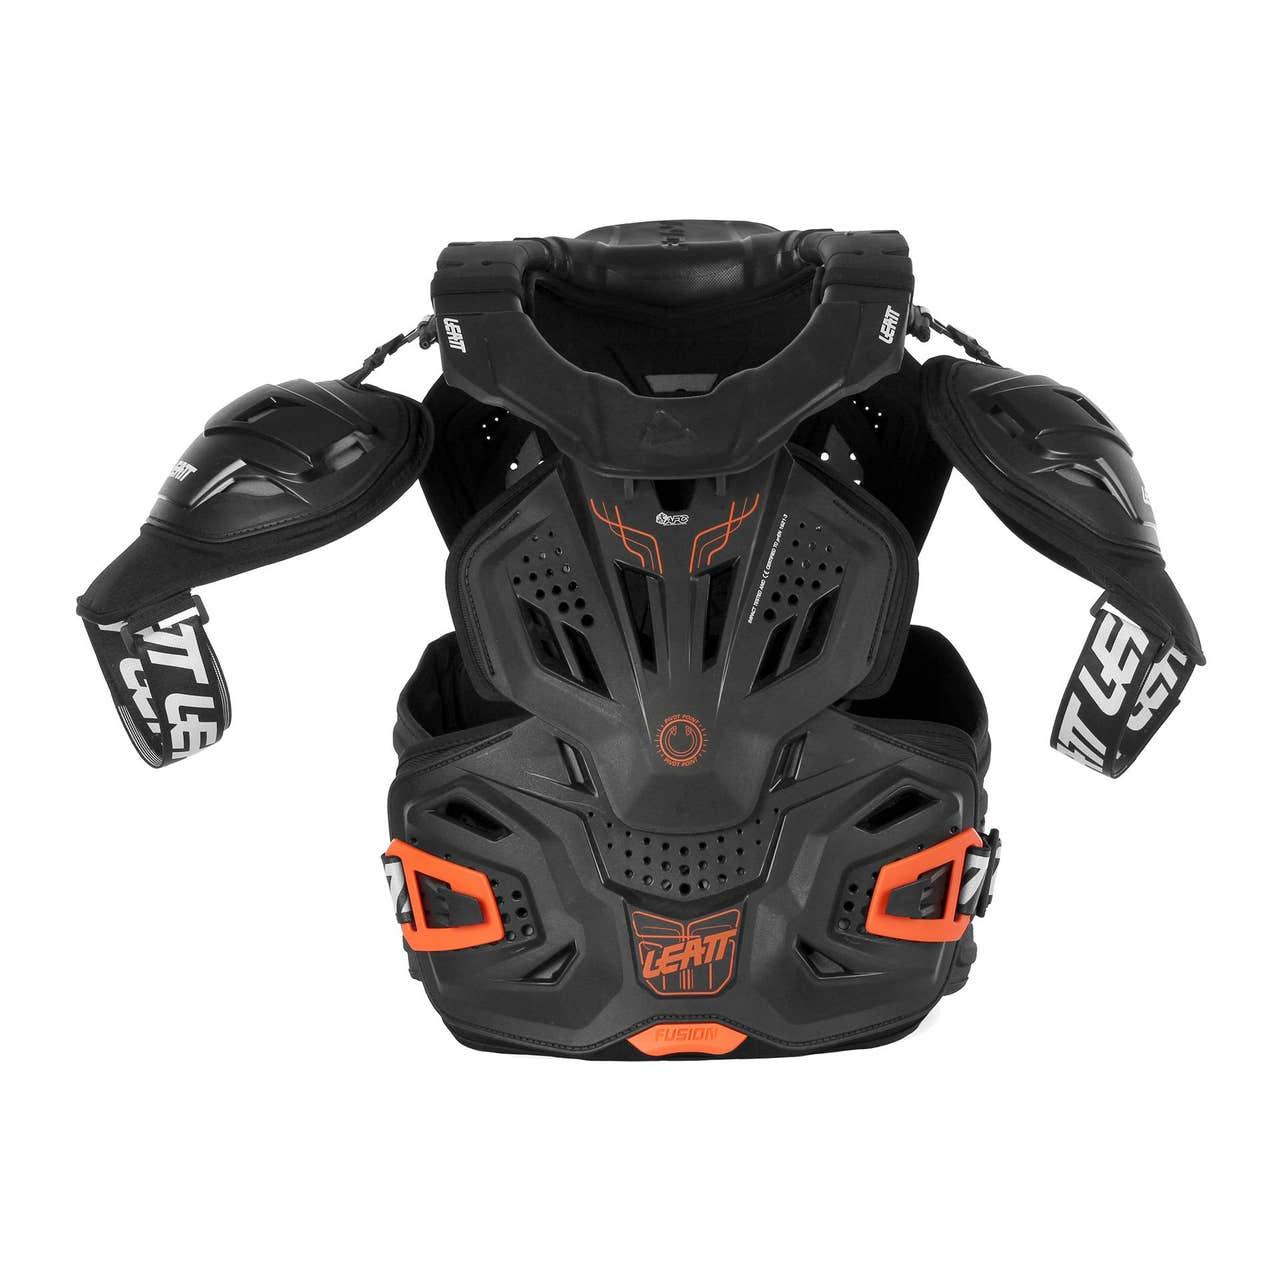 Fusion vest SNX 3.0